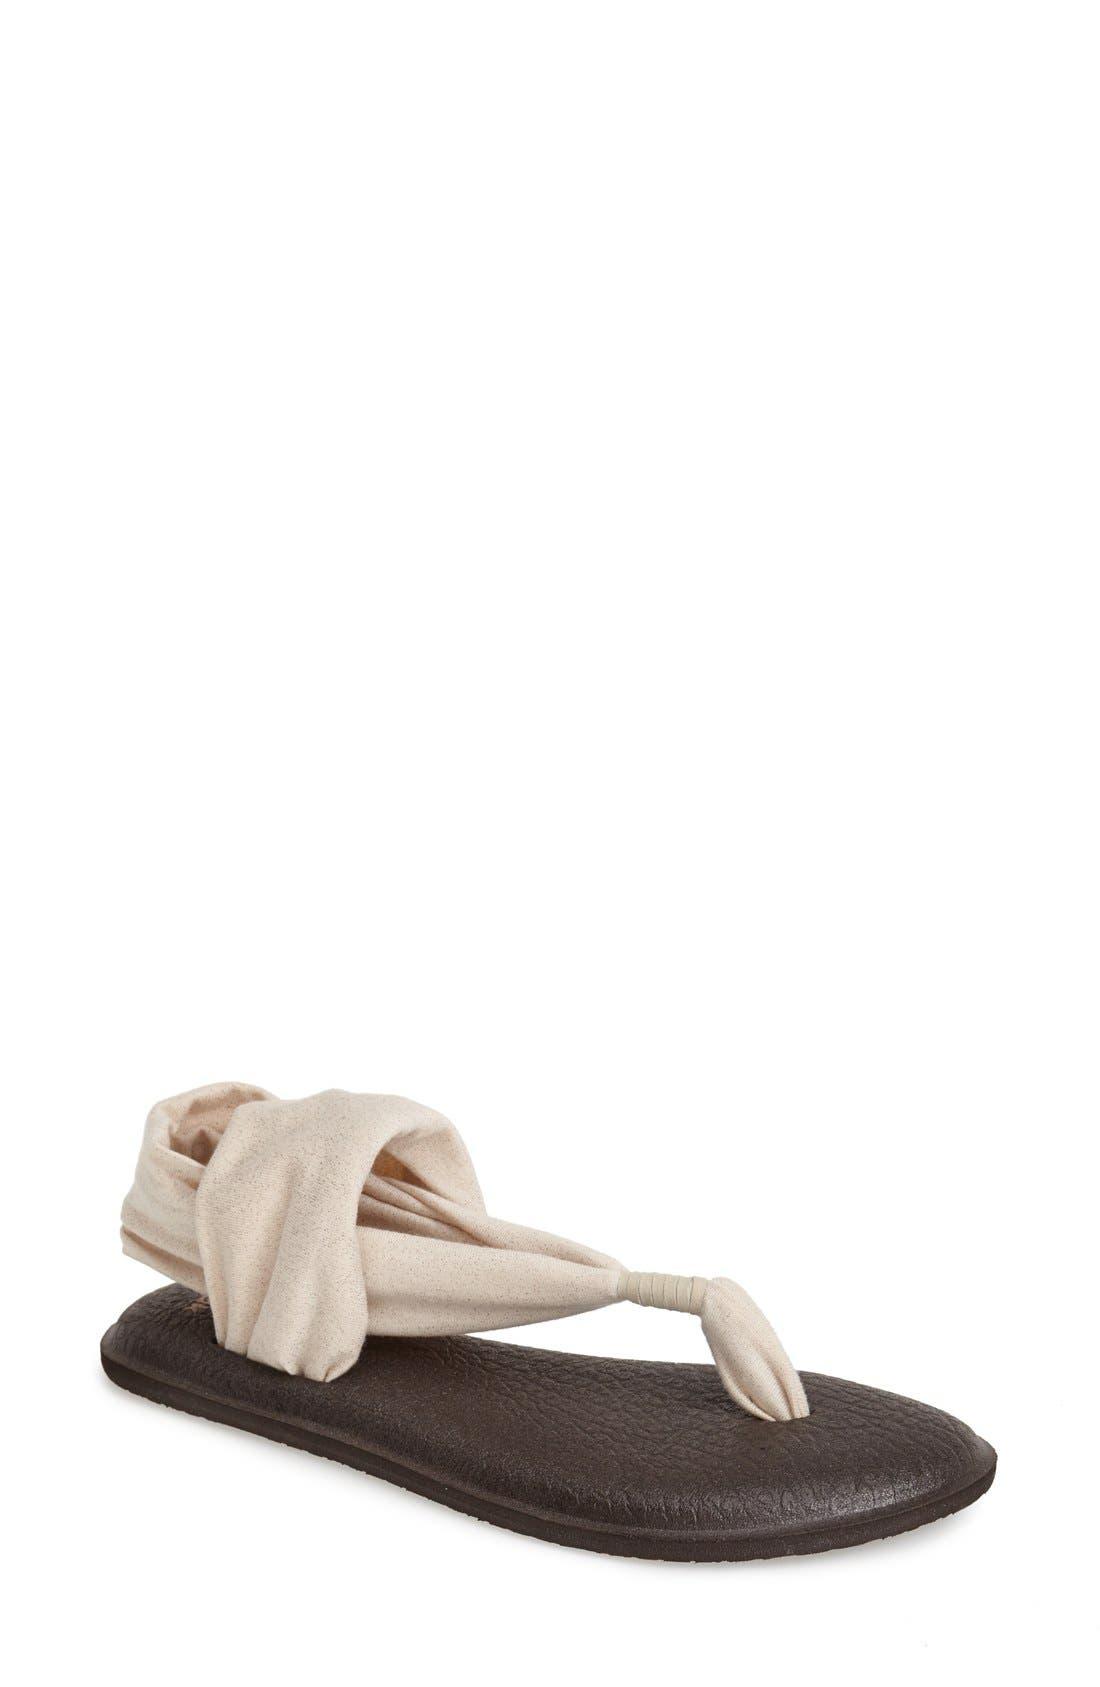 Alternate Image 1 Selected - Sanuk 'Yoga Metallic Sling' Sandal (Women)